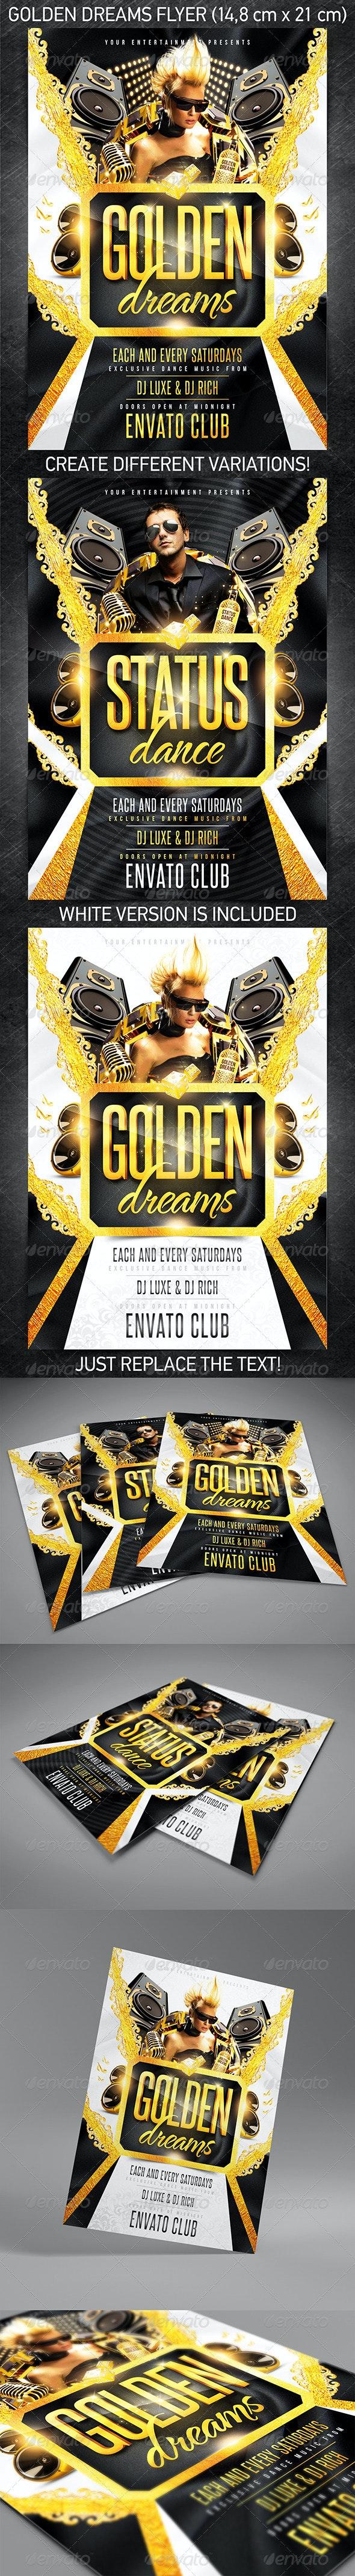 Golden Dreams Party Flyer - Events Flyers